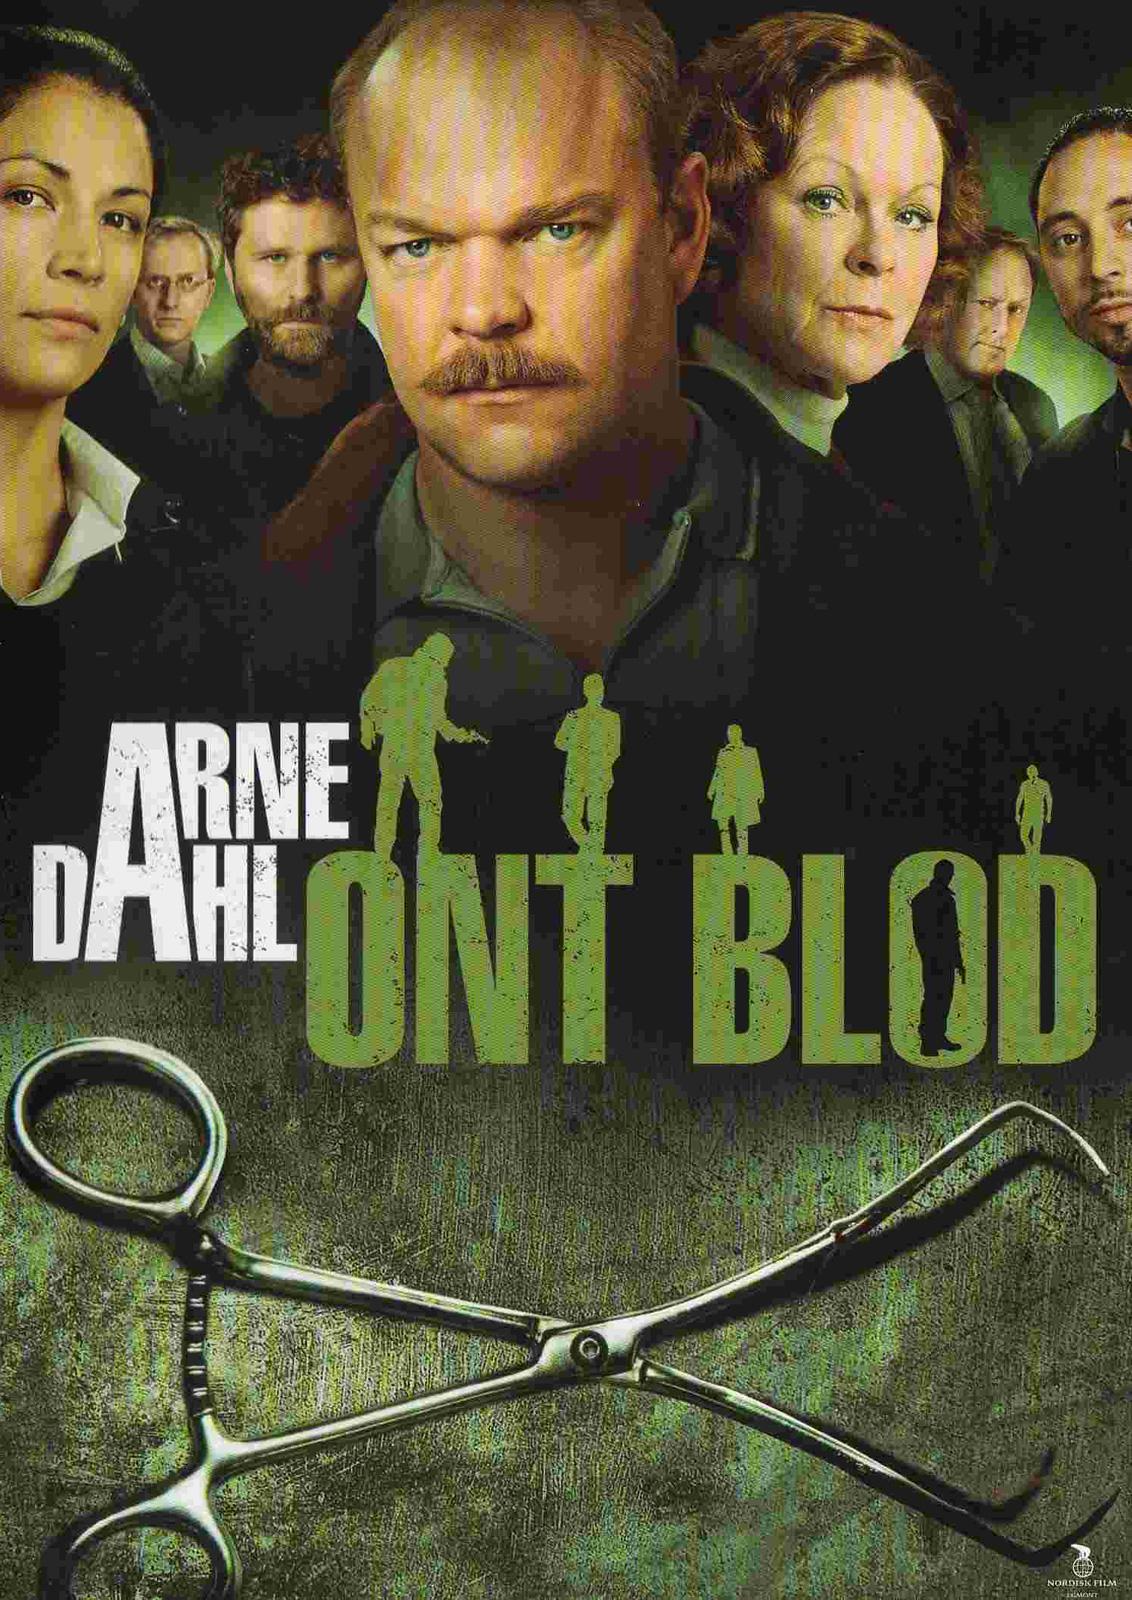 Arne Dahl: Ont blod (TV Mini-Series 2012) - IMDb